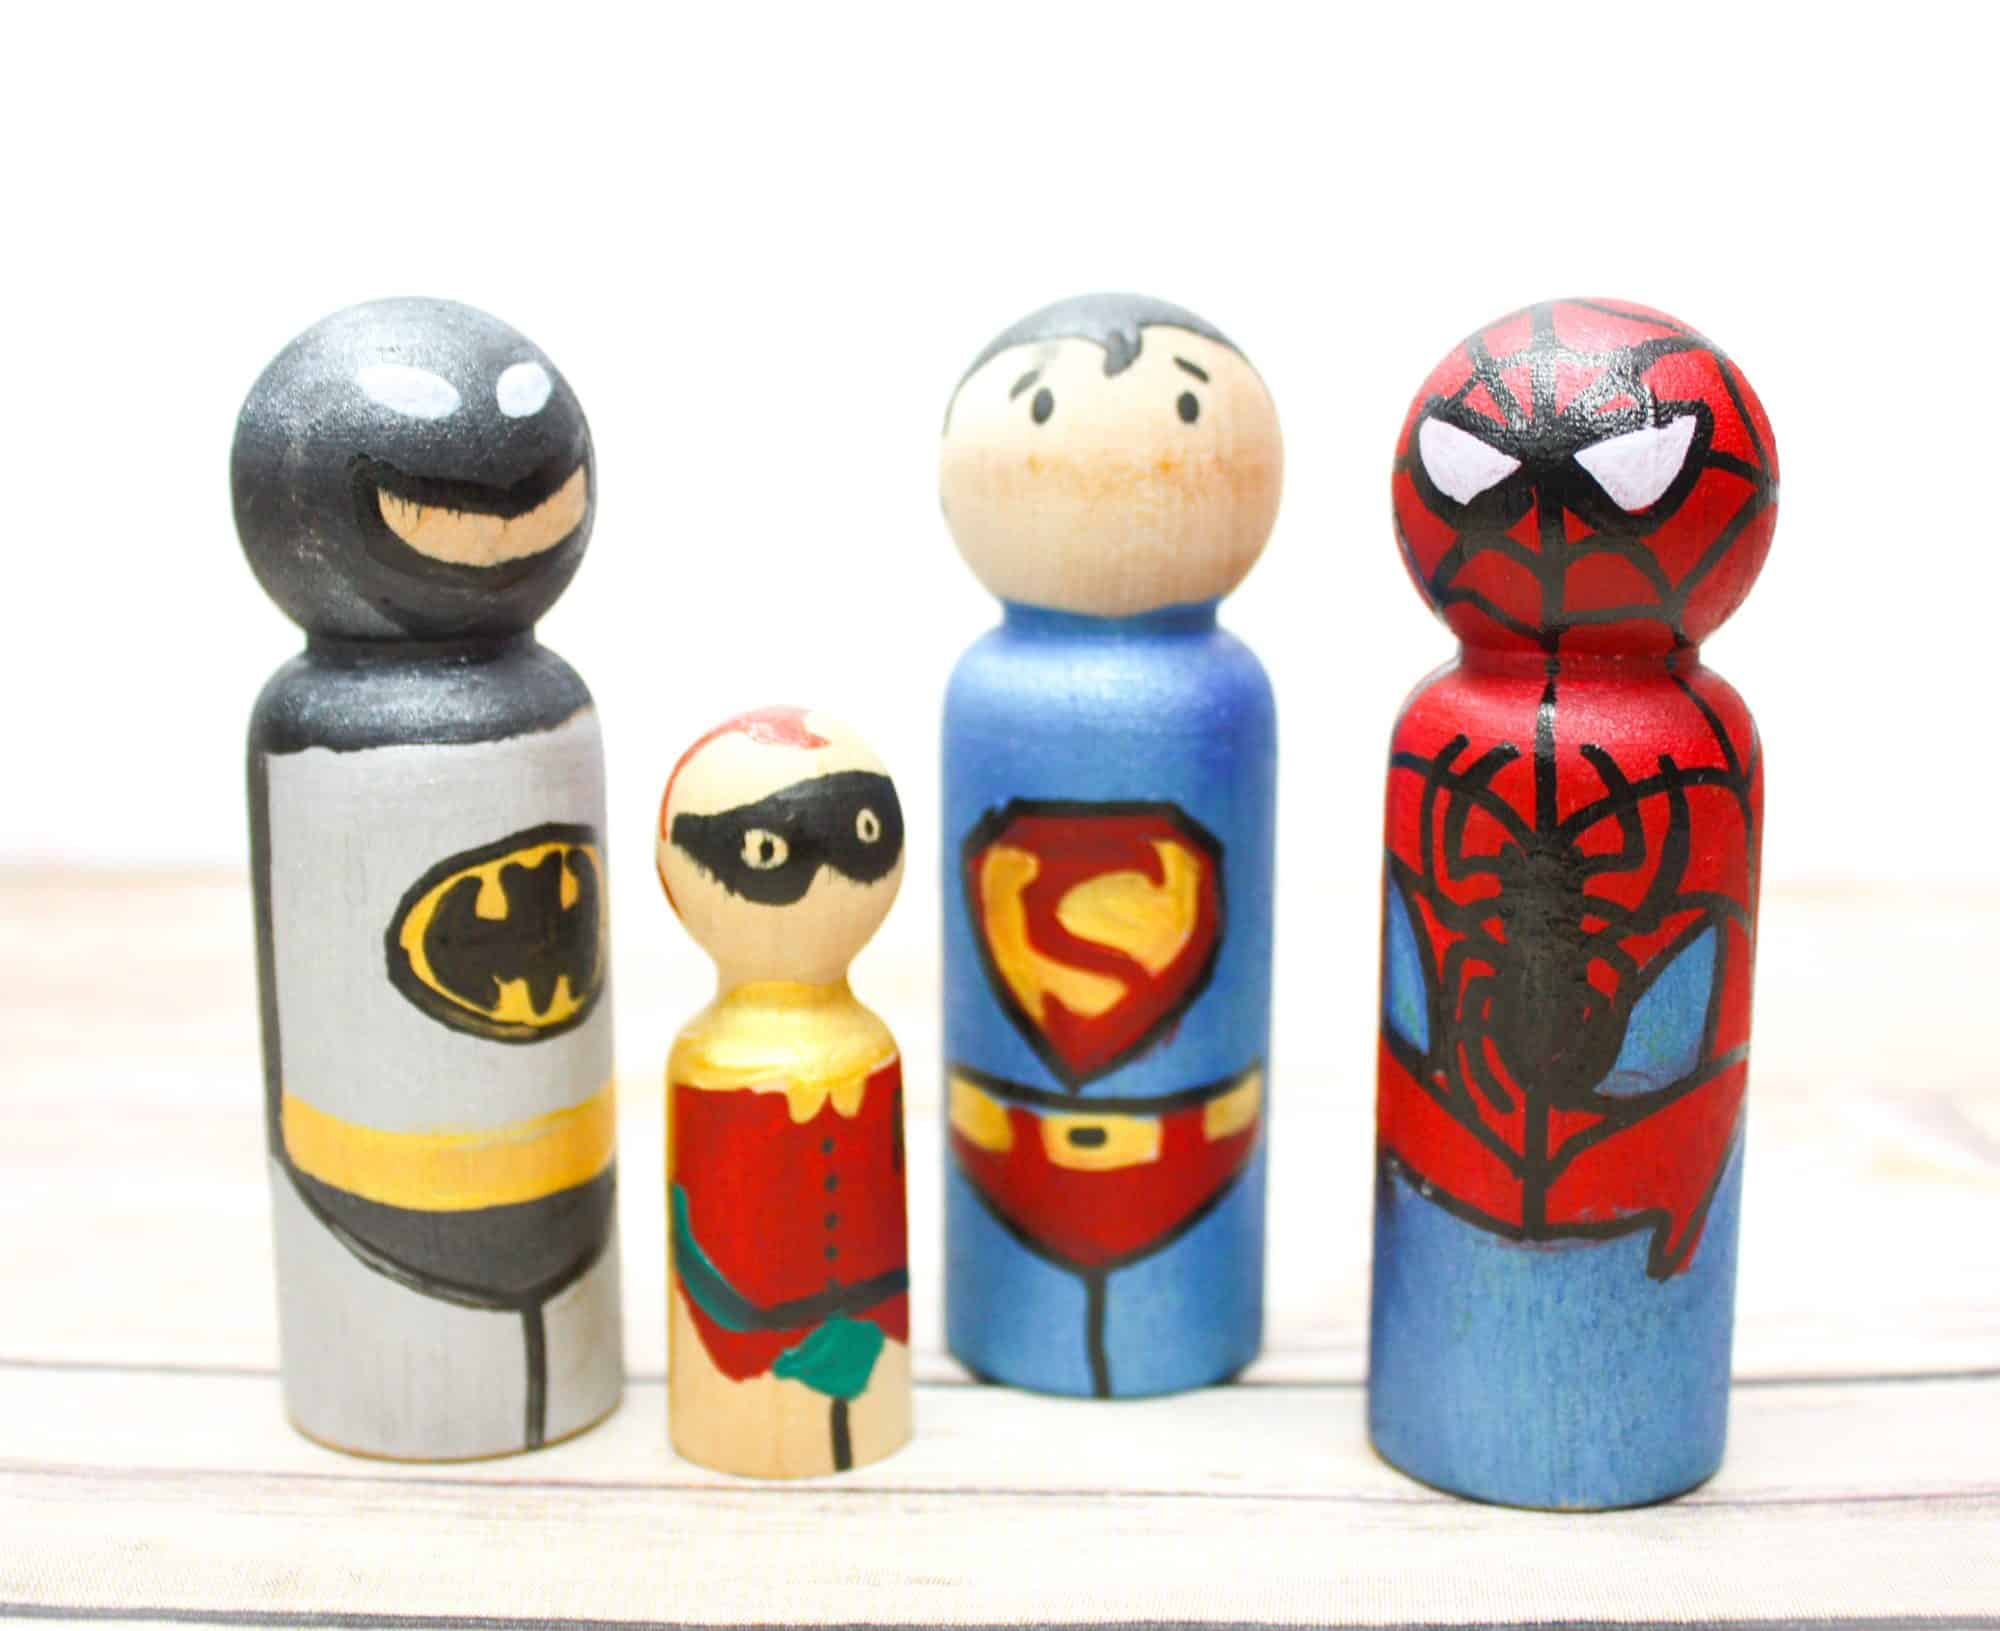 Wooden Superhero Peg Dolls: Simple DIY Toys